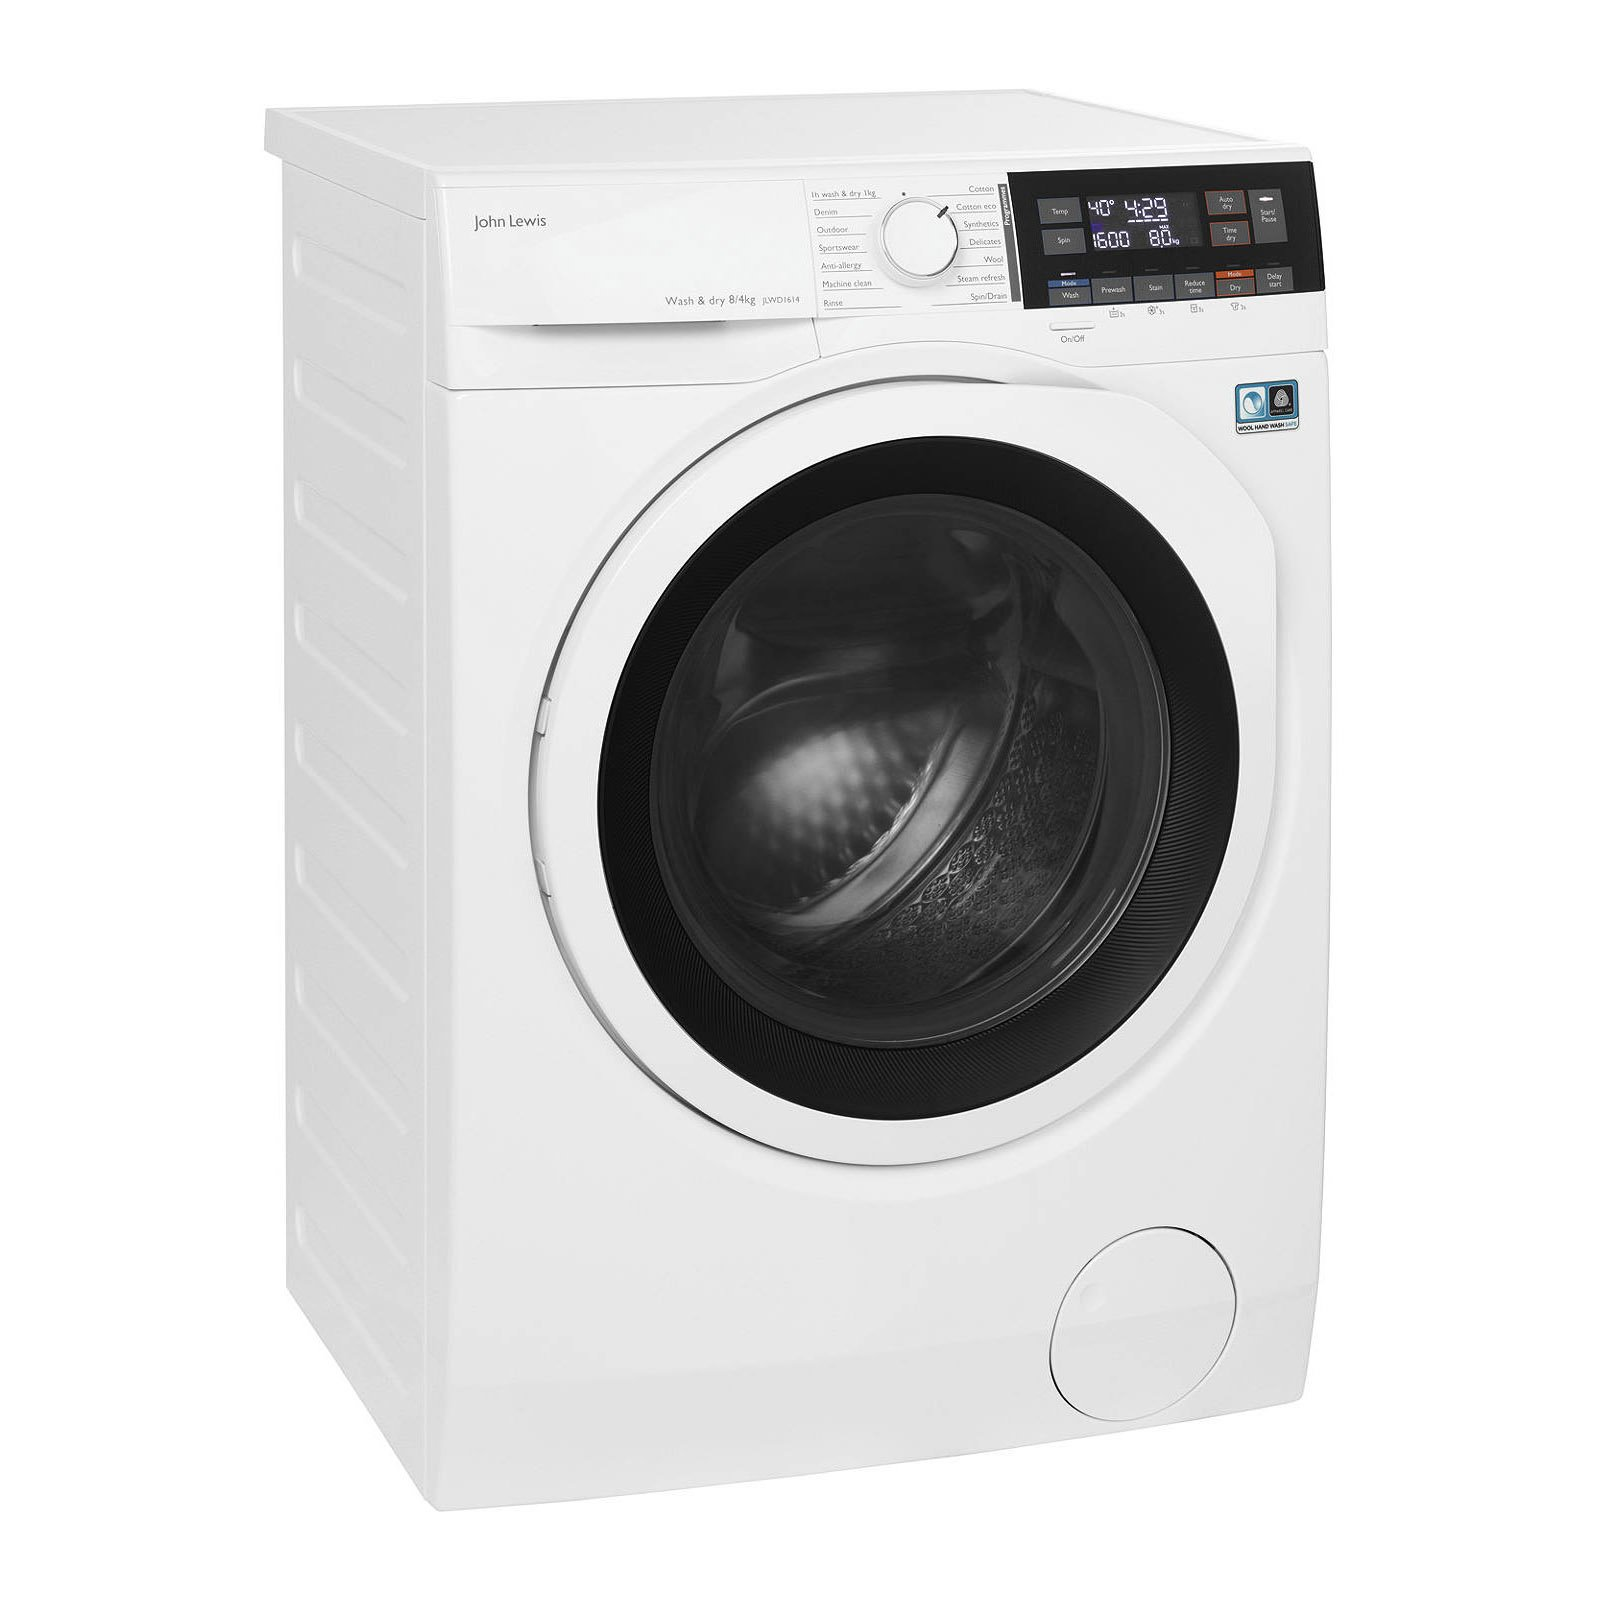 Best Washer Dryer 2019 The Best Integrated Washer Dryer